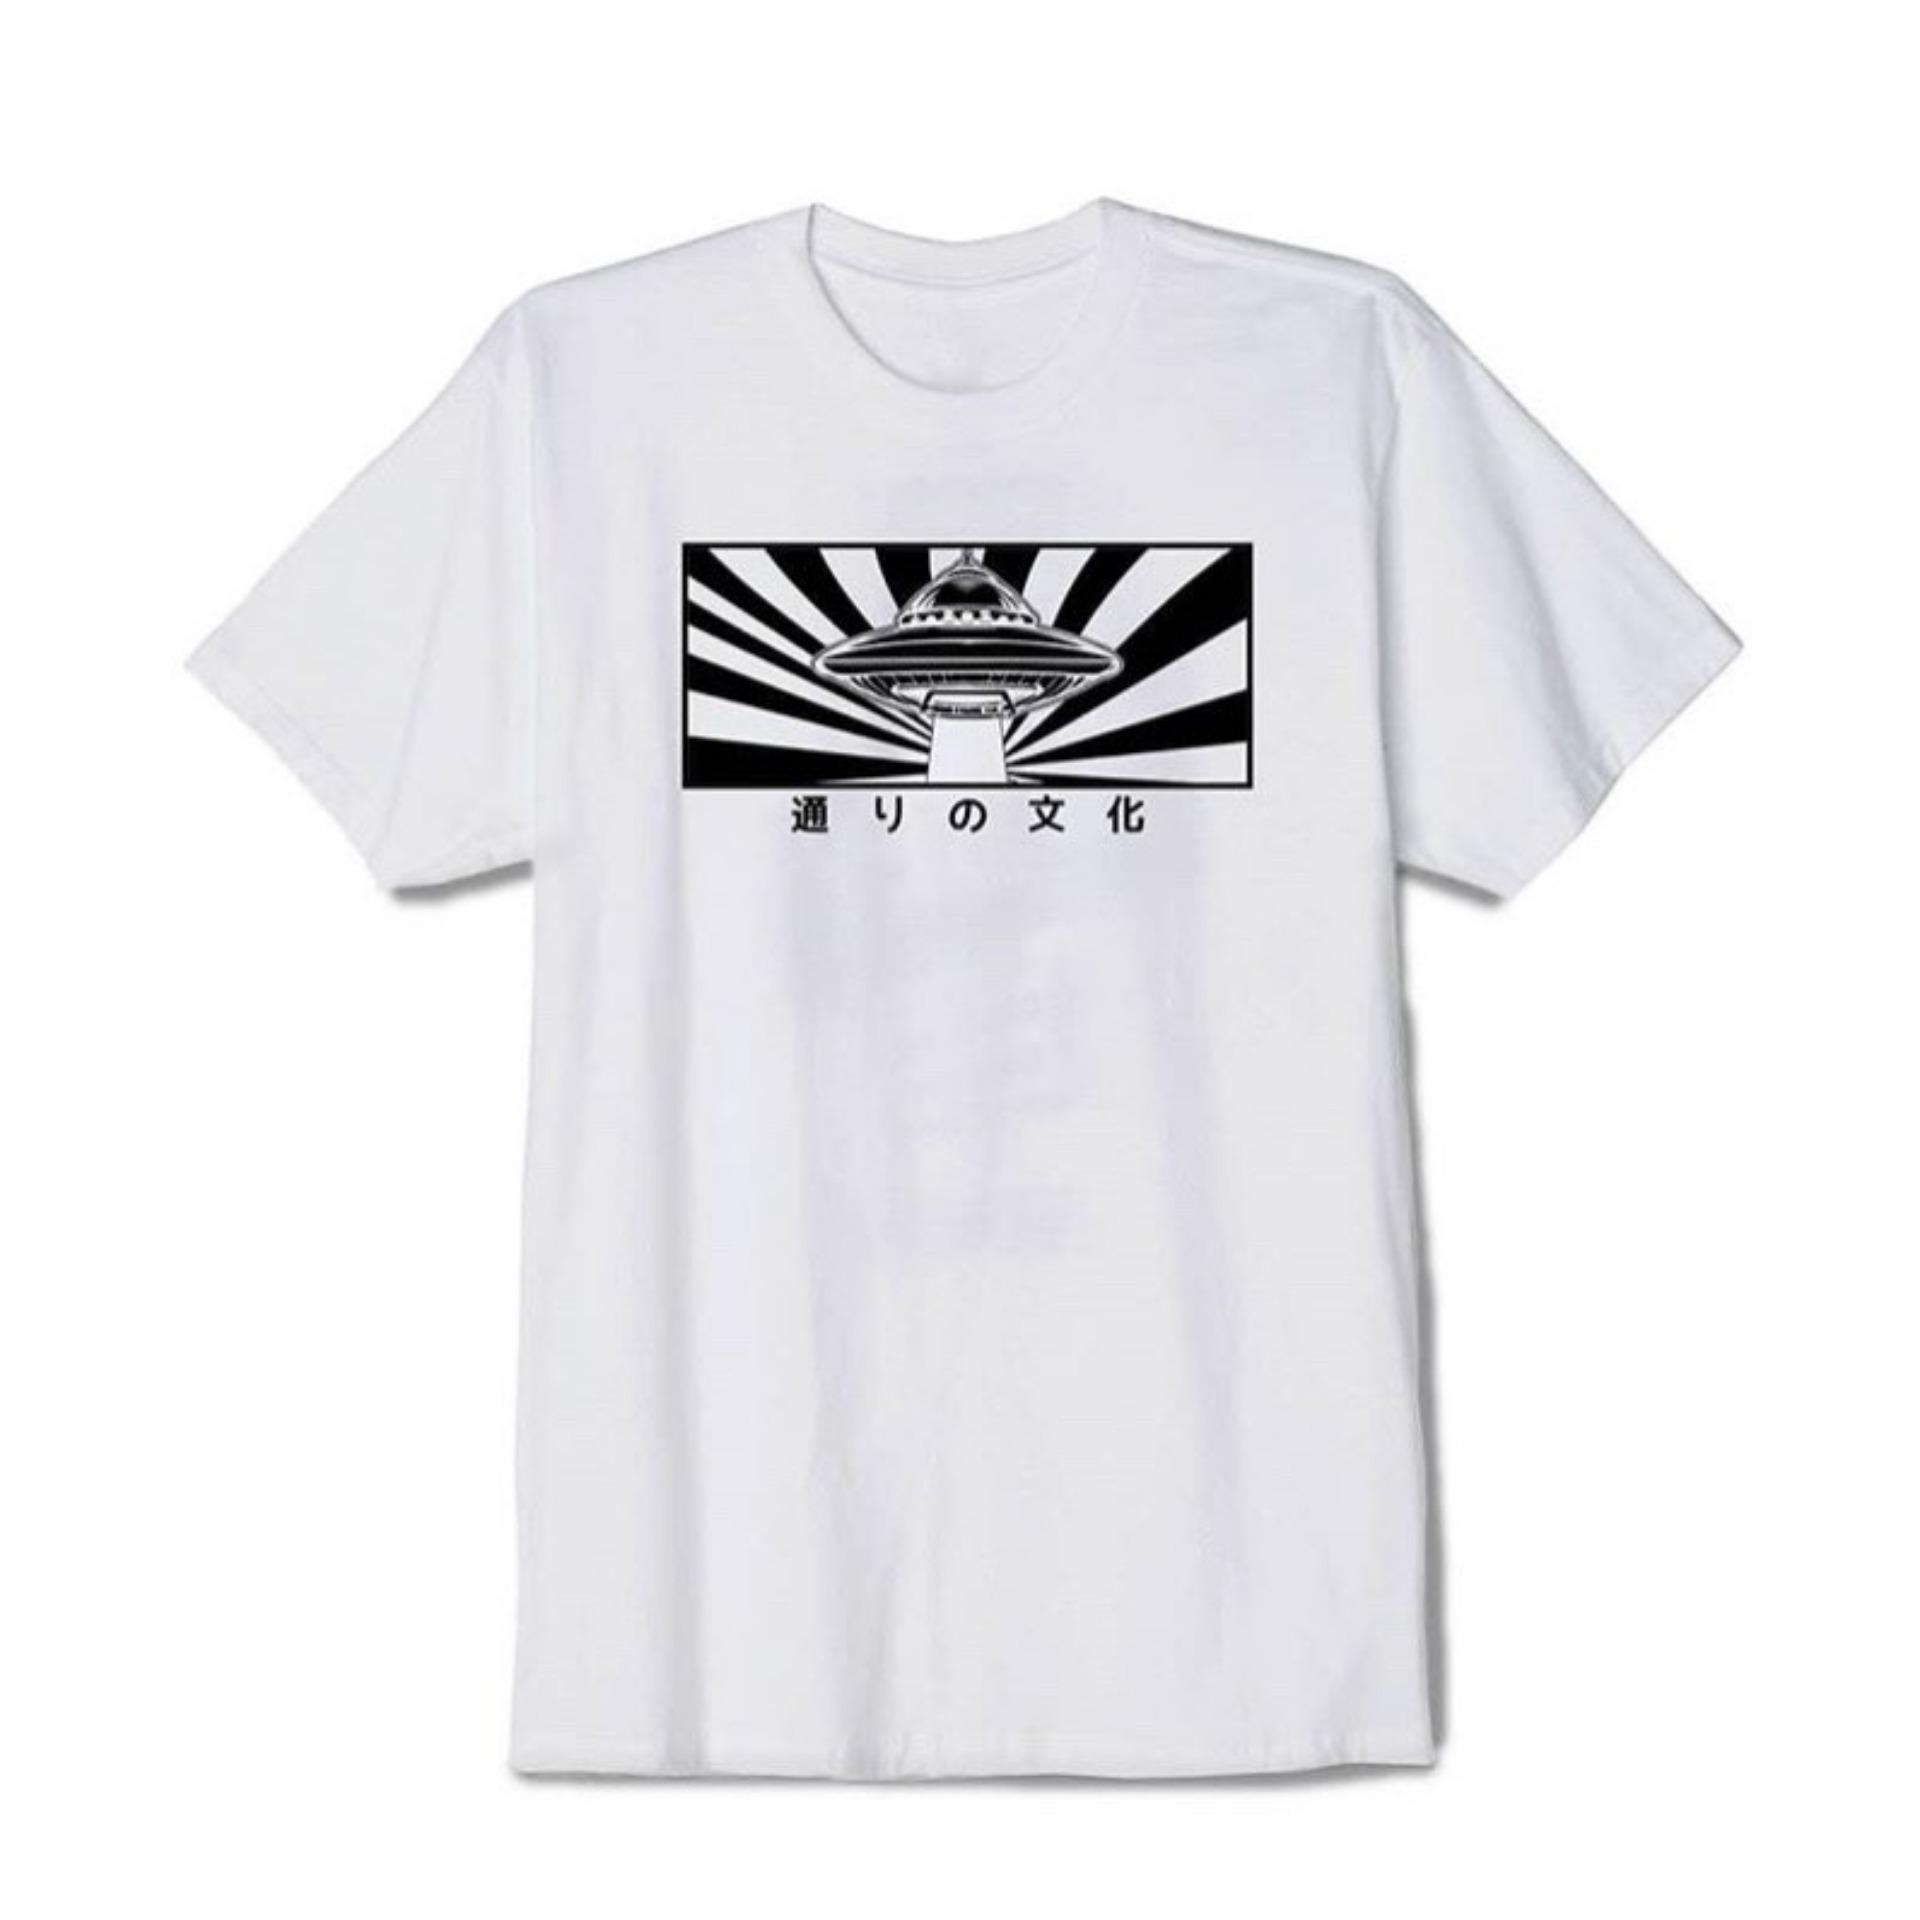 HIGH5 Fashion Pria Kaos Lengan Pendek DND PLANET JAPAN putih